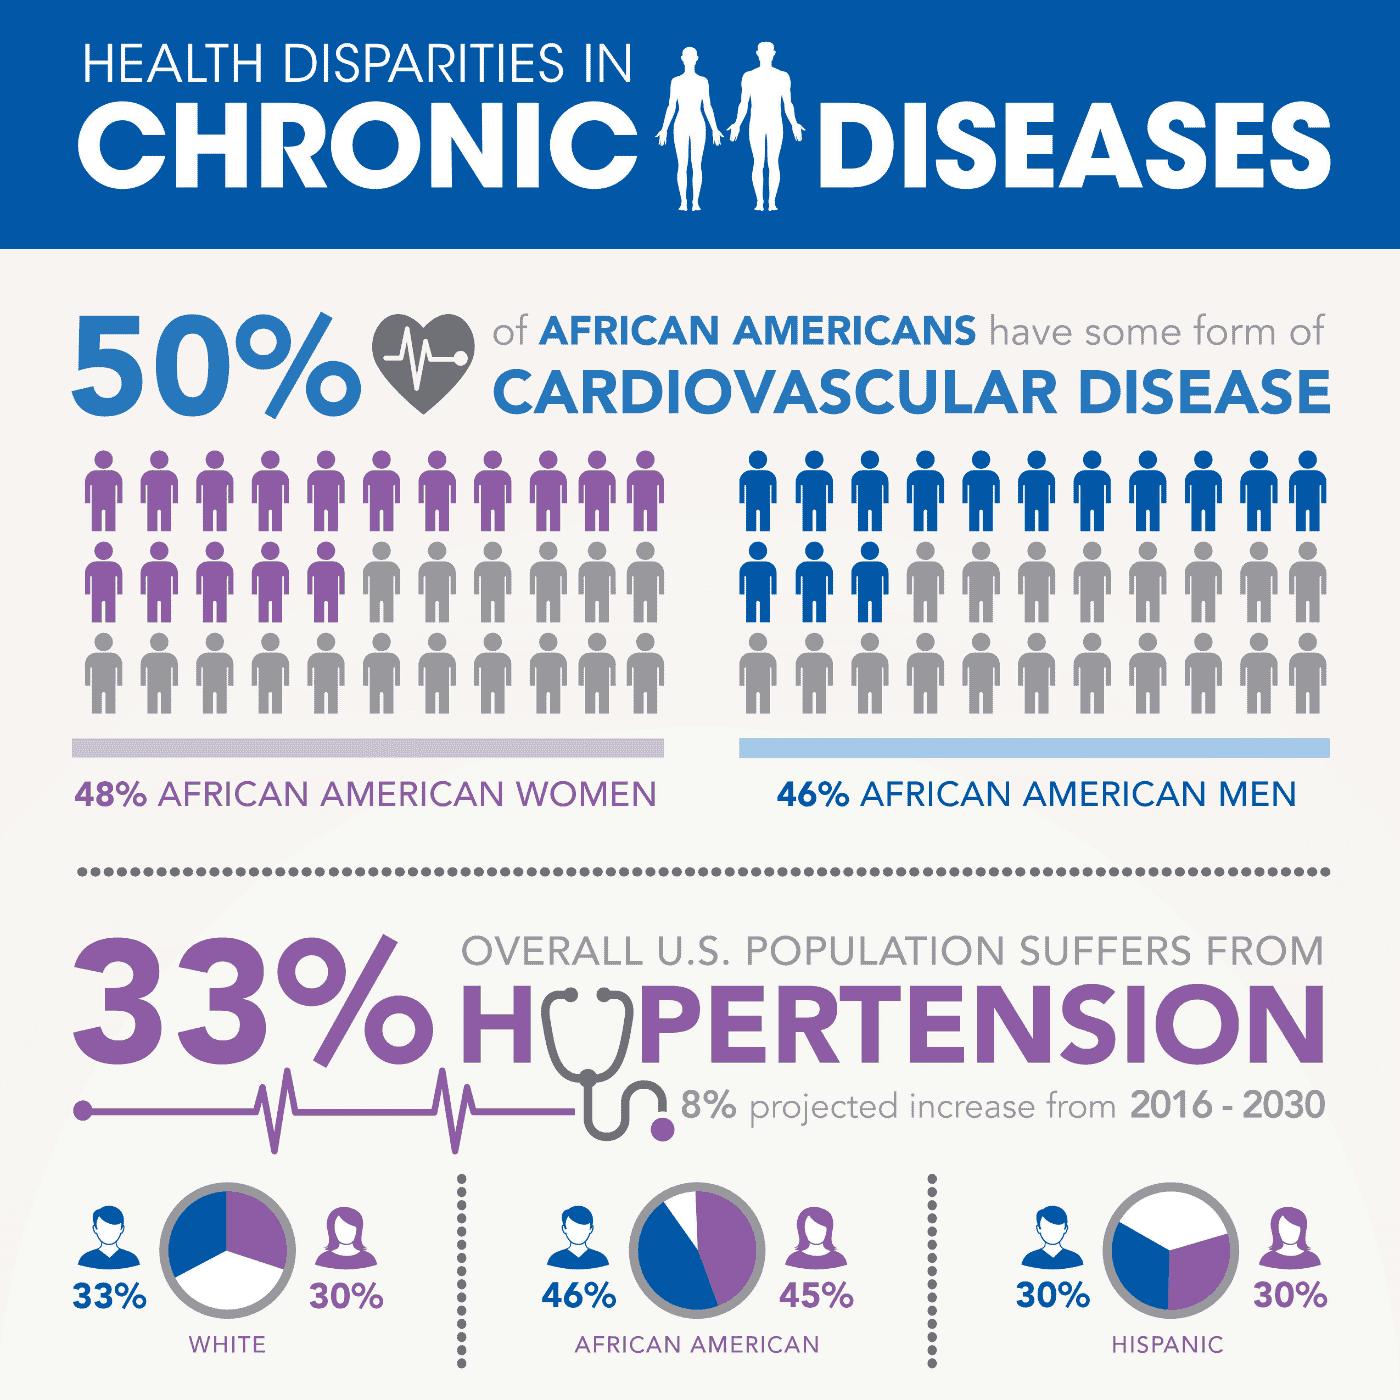 health disparities in chronic diseases, healthcare infographic